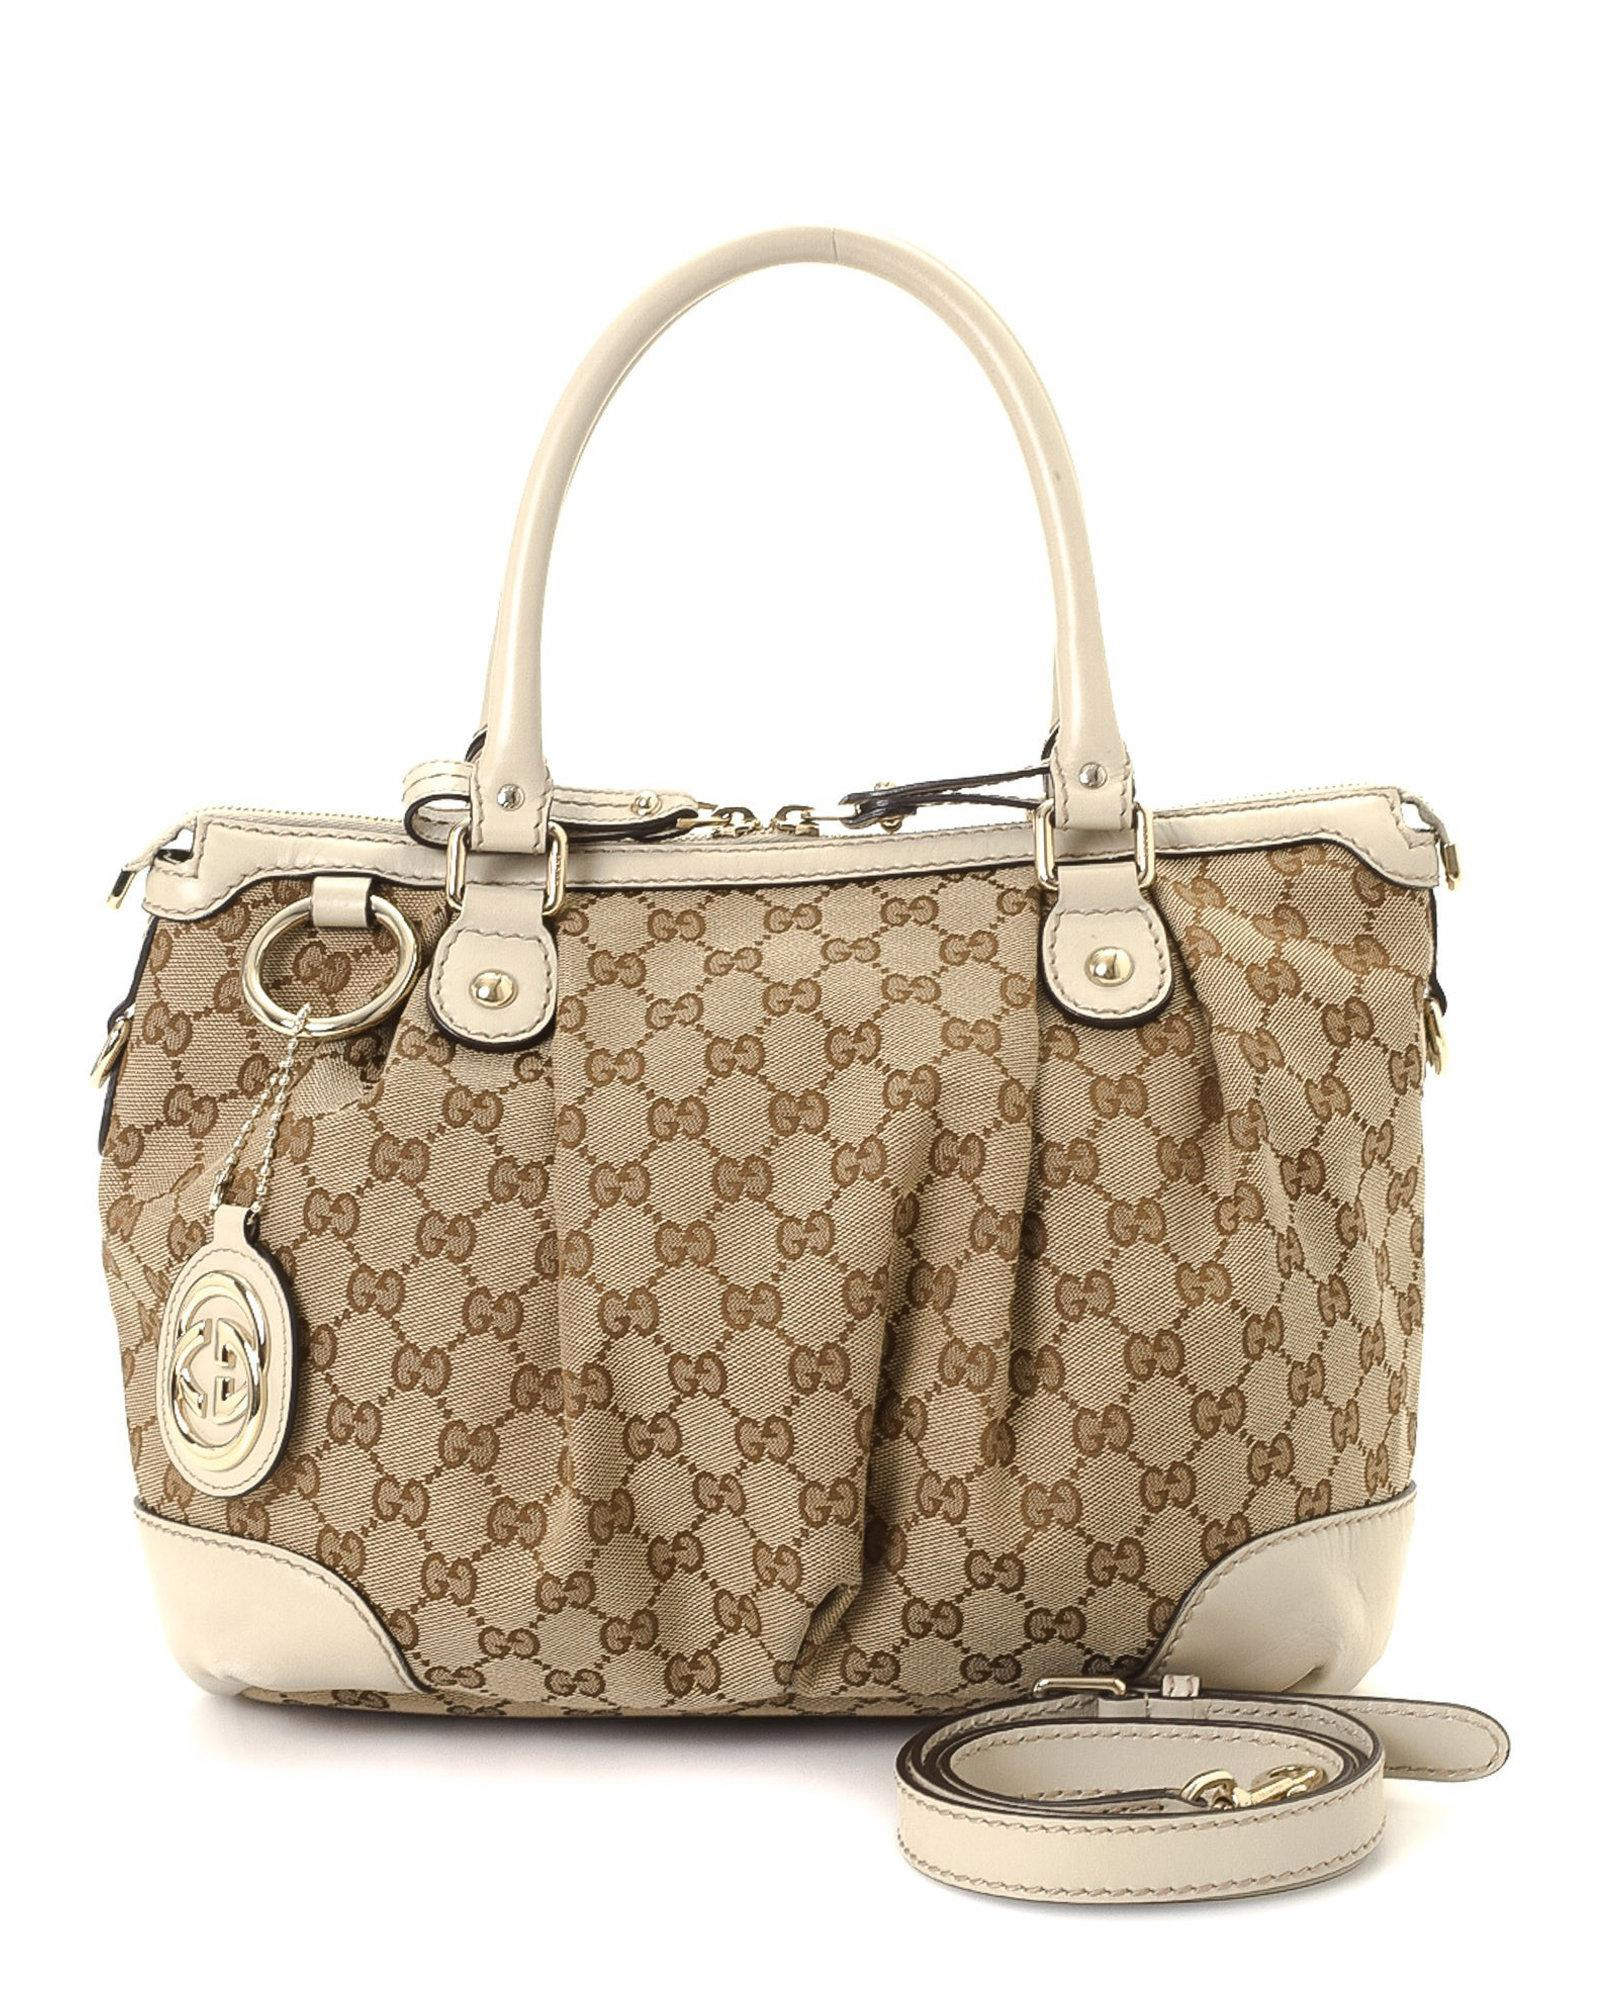 0ae9a2b7b Gucci Gg Canvas Sukey Two-way Handbag - Vintage in Natural - Lyst